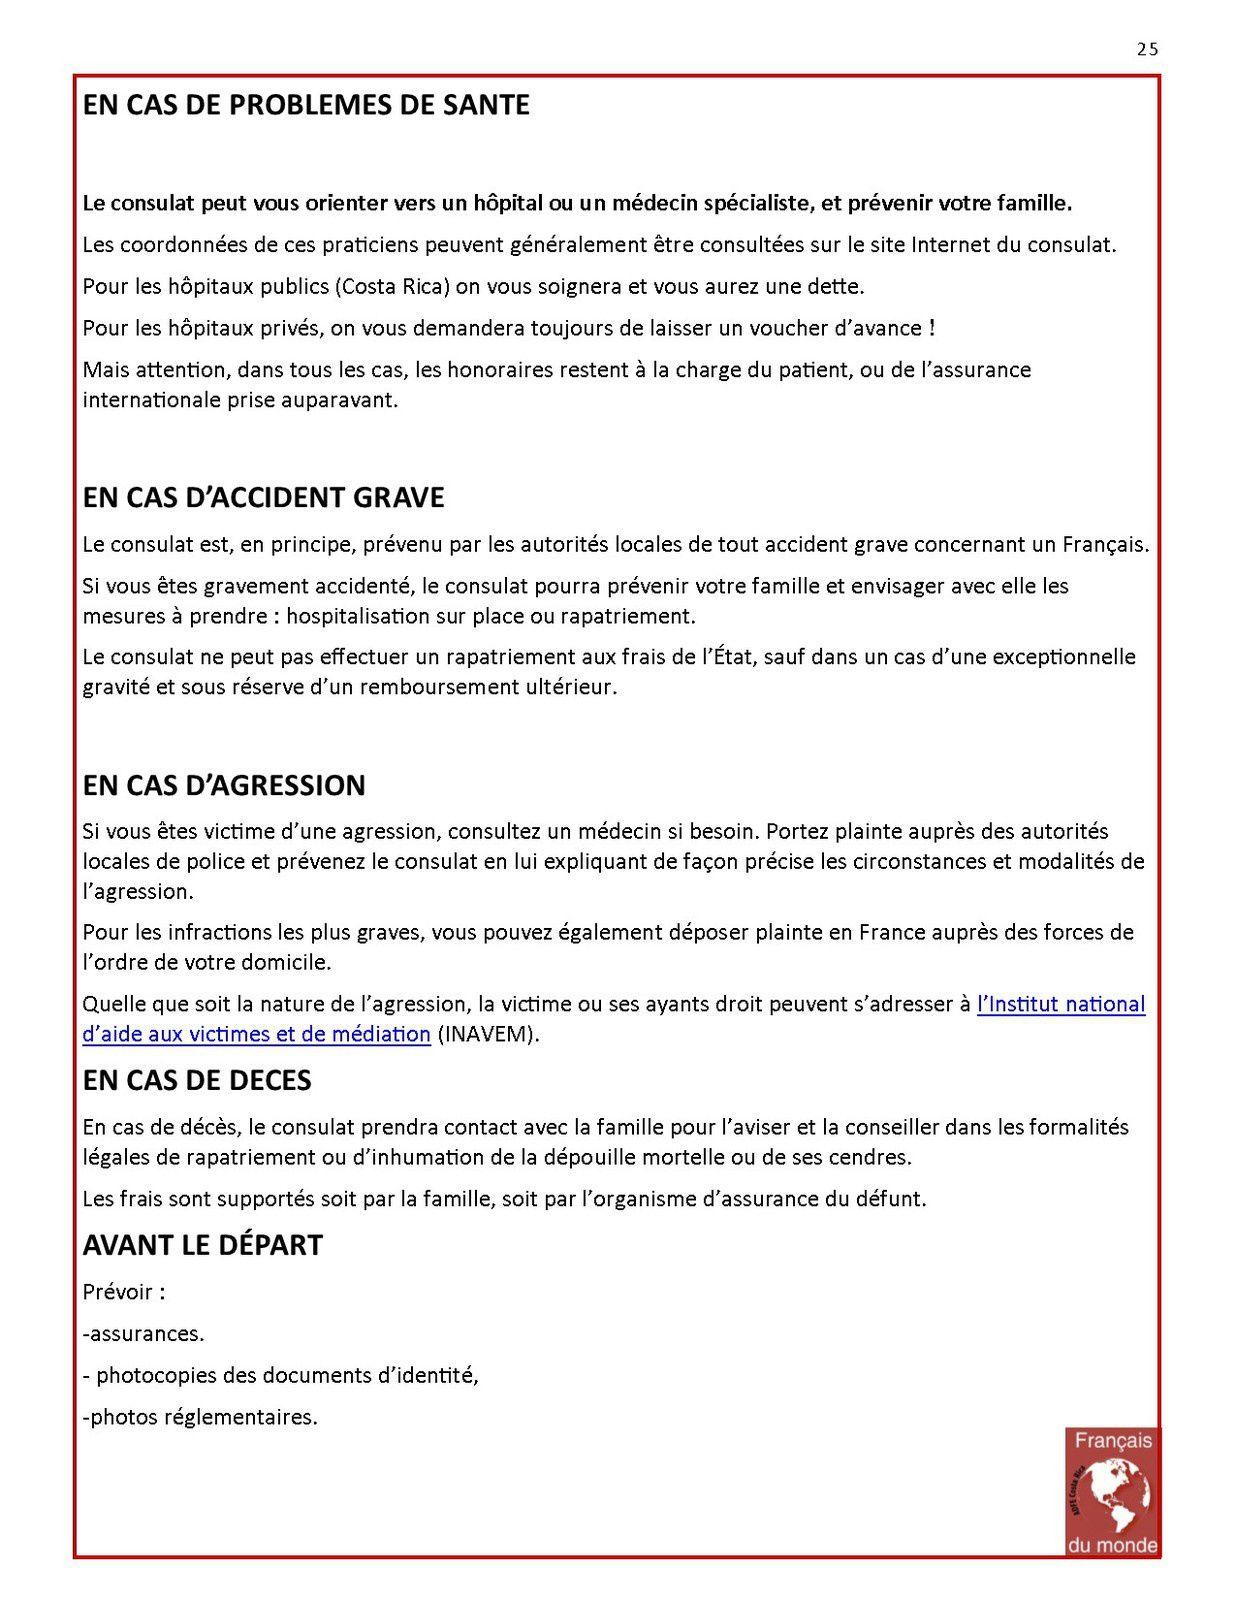 FDM-Costa Rica Accueil, 15 fiches-conseils